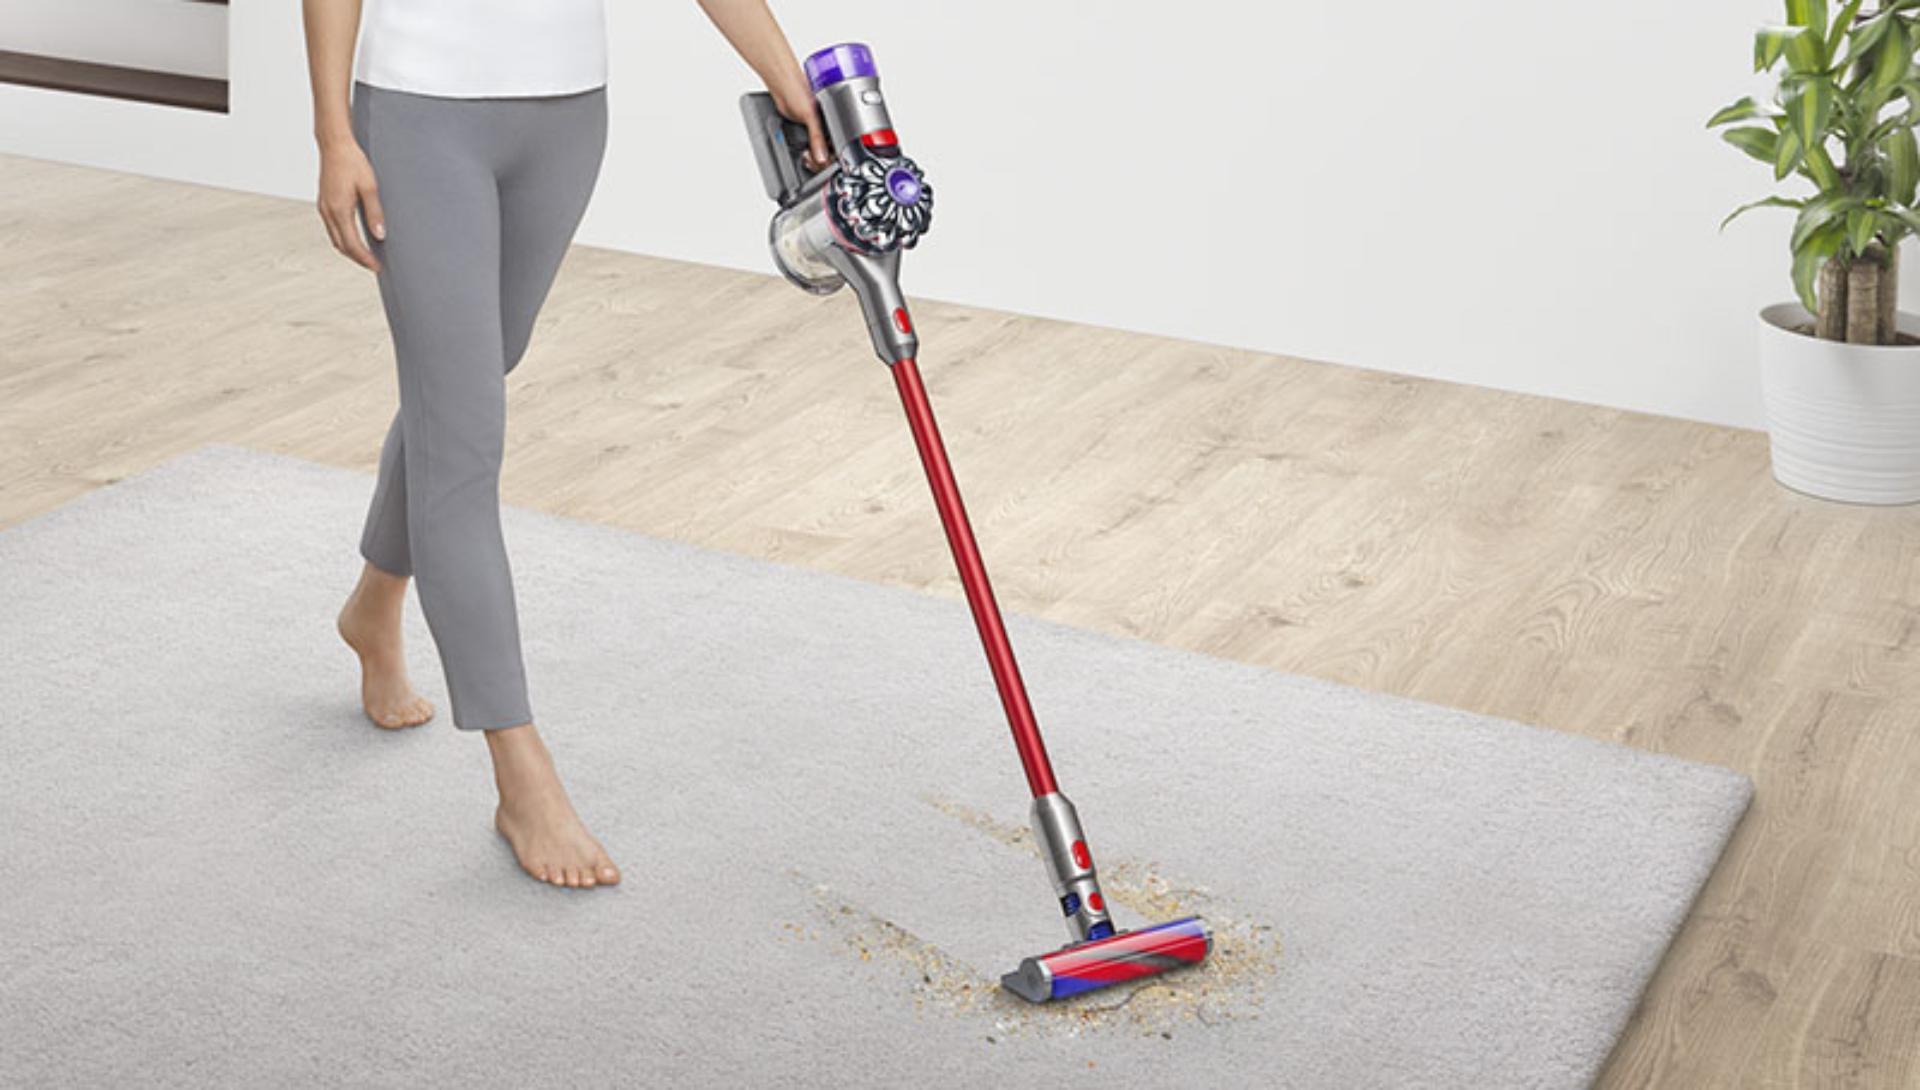 Dyson V8 slim being used on flooring